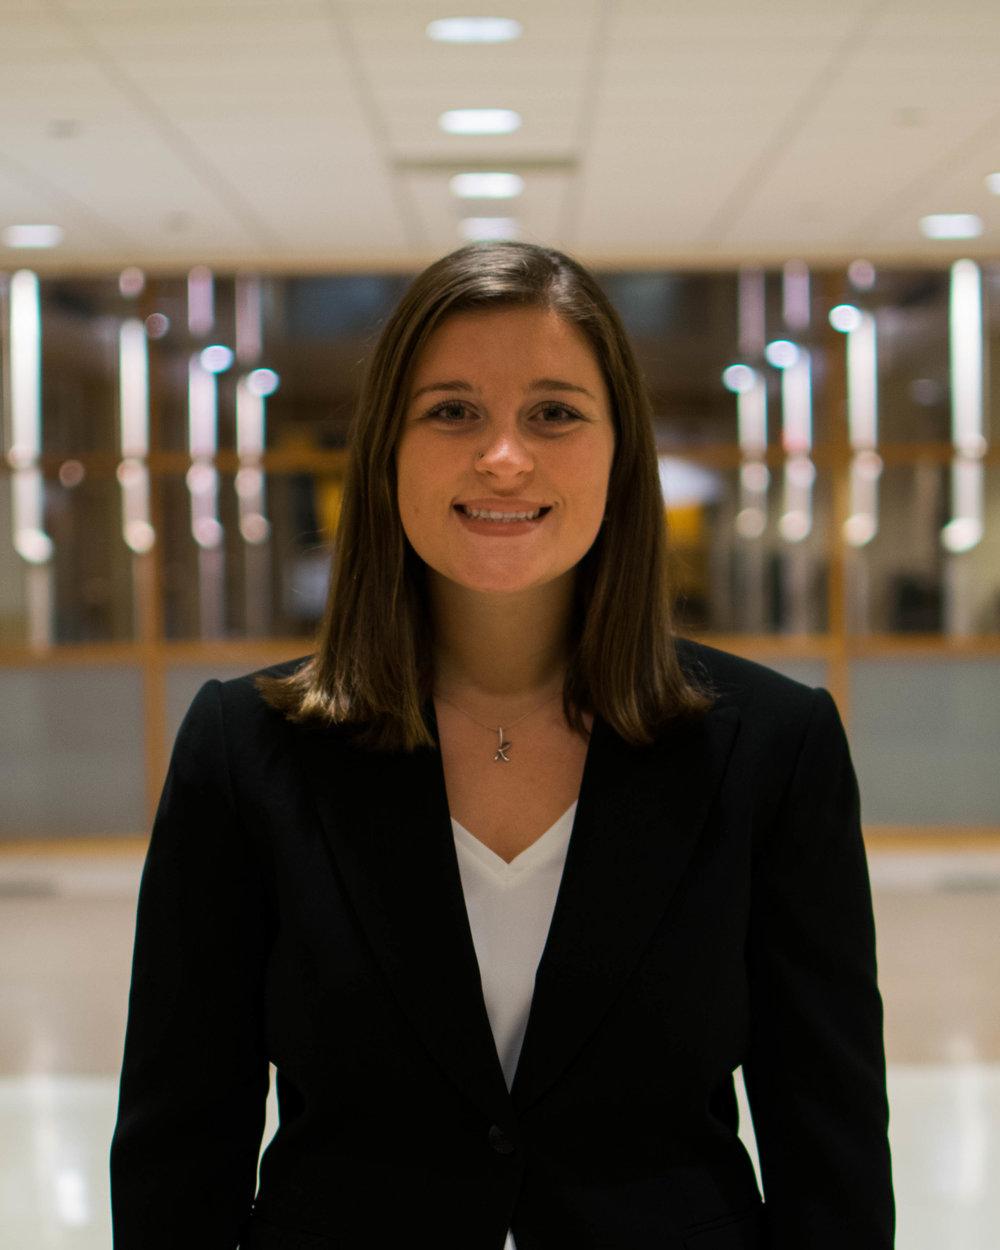 Kelsie Granitzki Director of Nonprofit Consulting terpama.nonprofit@gmail.com